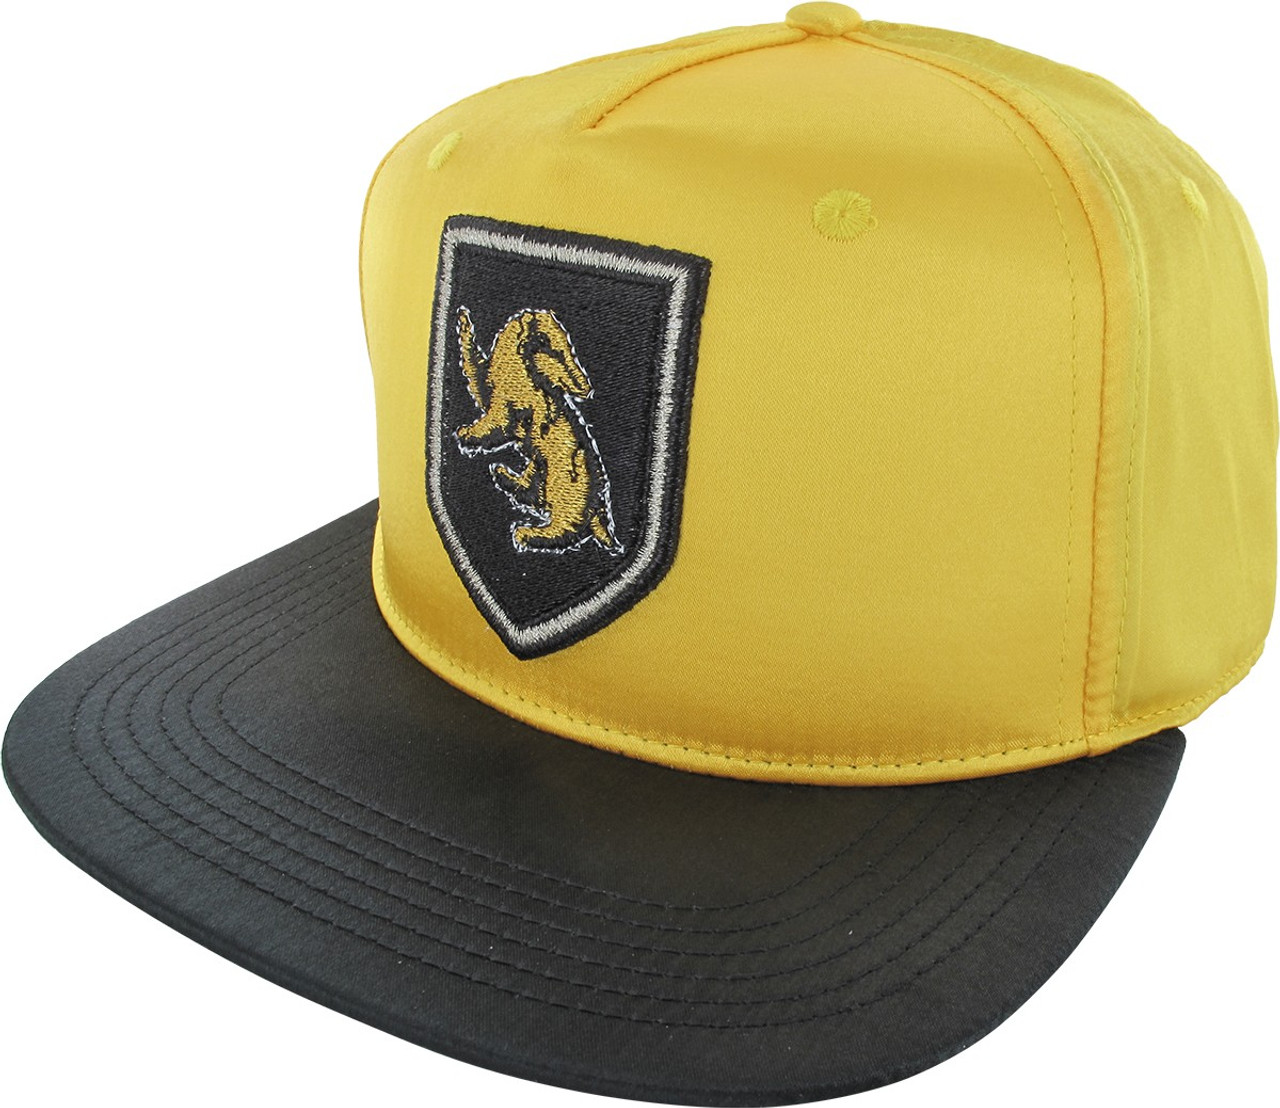 hat-harry-potter-huffle-satin-snap  03956.1525380308.jpg c 2 imbypass on 467a83b4b8ae